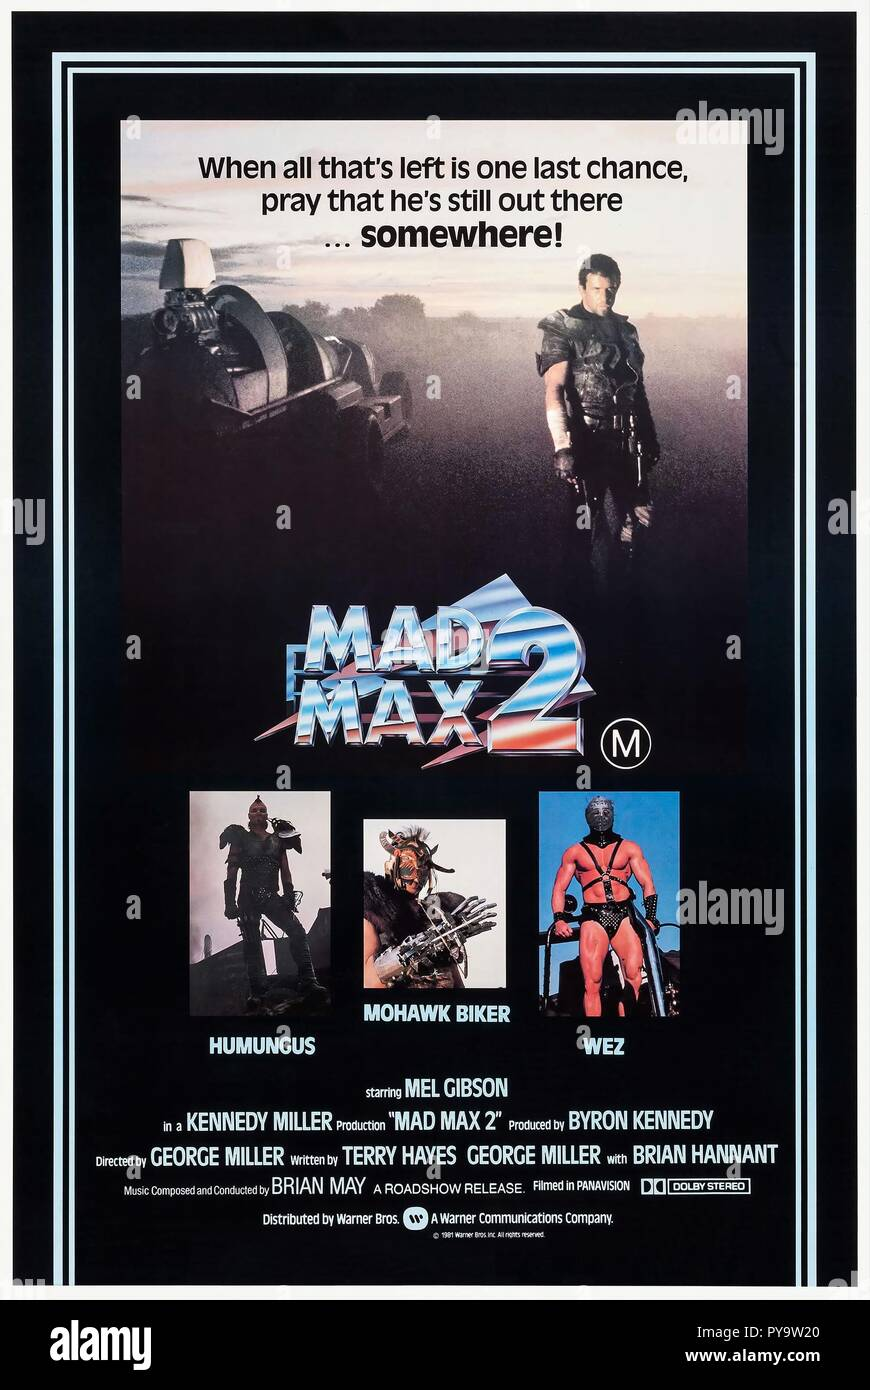 Original film title: THE MAD MAX II: ROAD WARRIOR. English title: THE MAD MAX II: ROAD WARRIOR. Year: 1981. Director: GEORGE MILLER. Credit: WARNER BROTHERS / Album Stock Photo